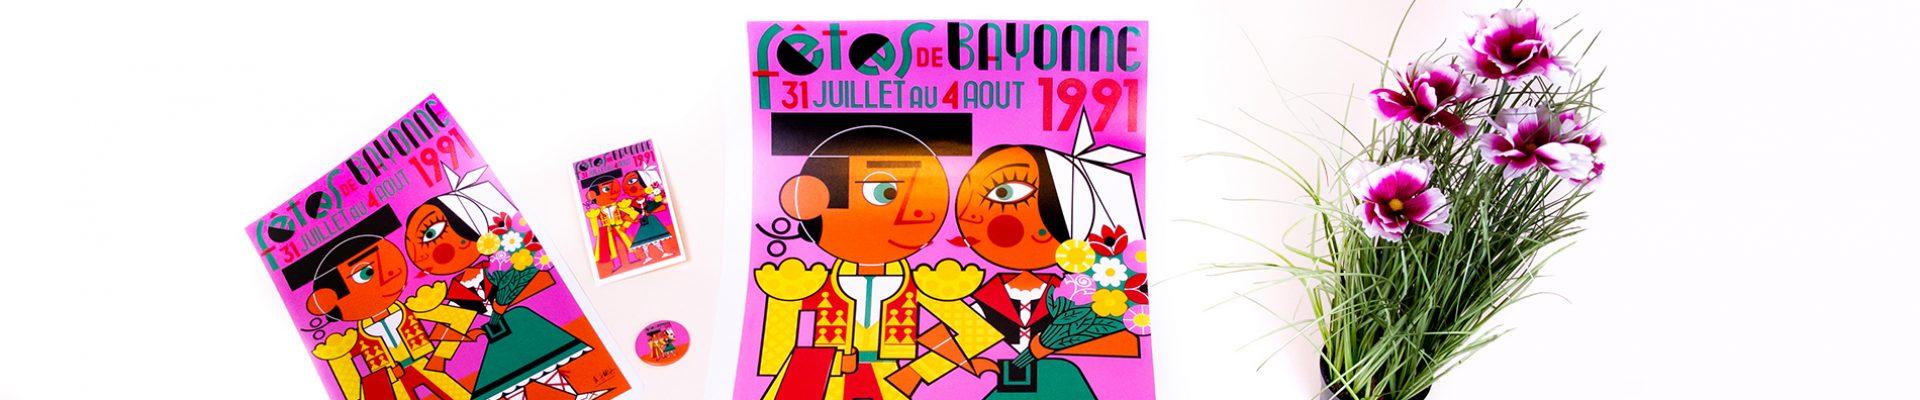 header Fêtes de Bayonne OT Bayonne © M.Prat